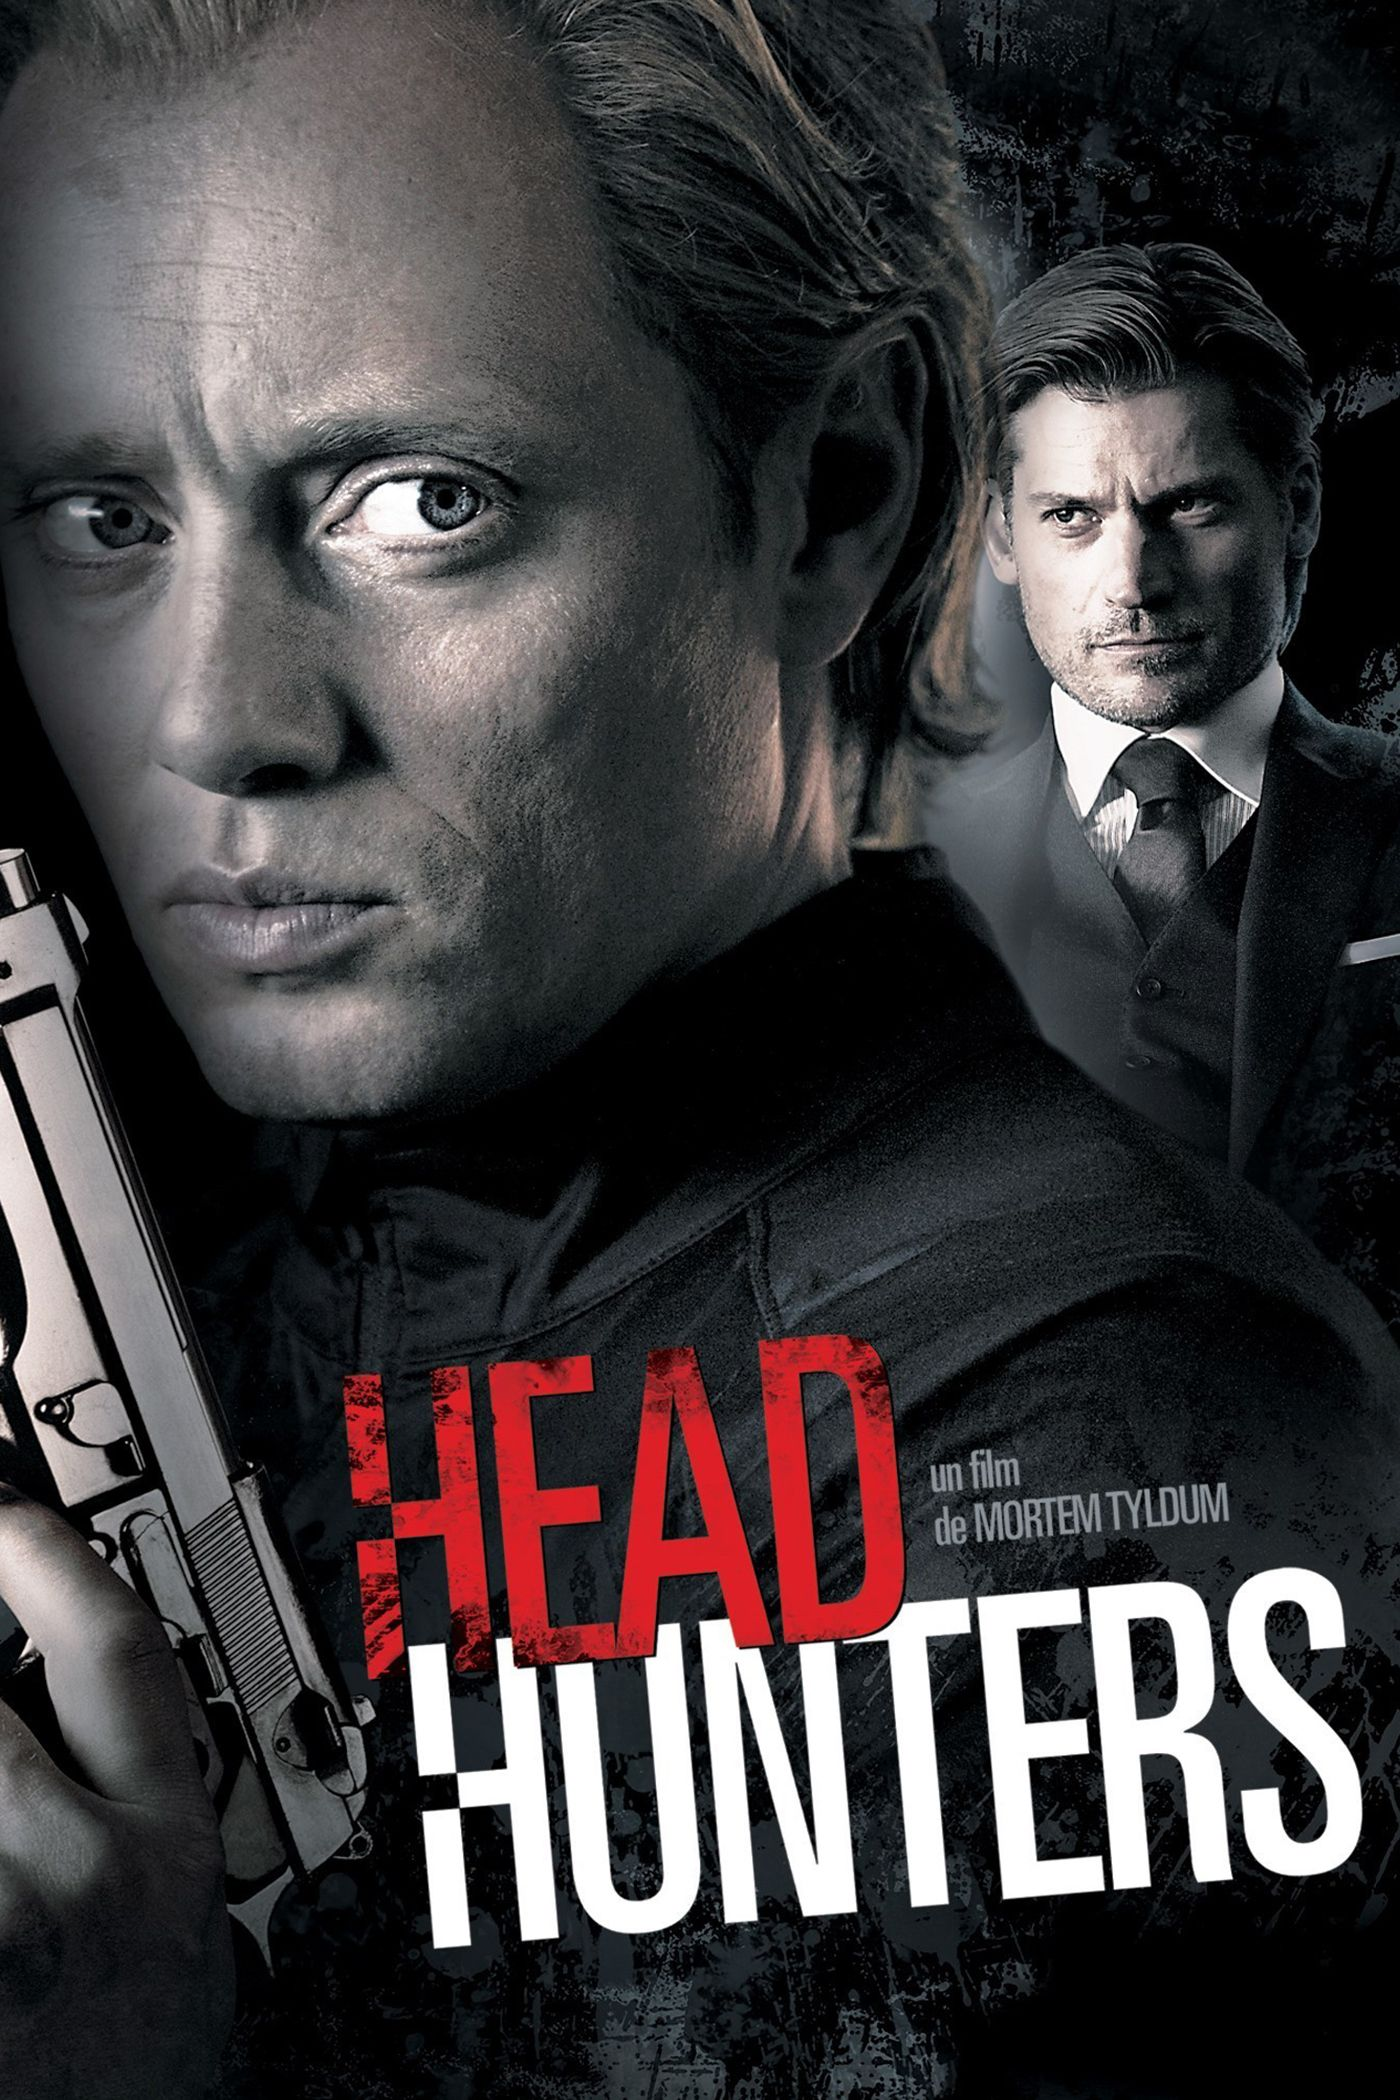 Film Headhunters